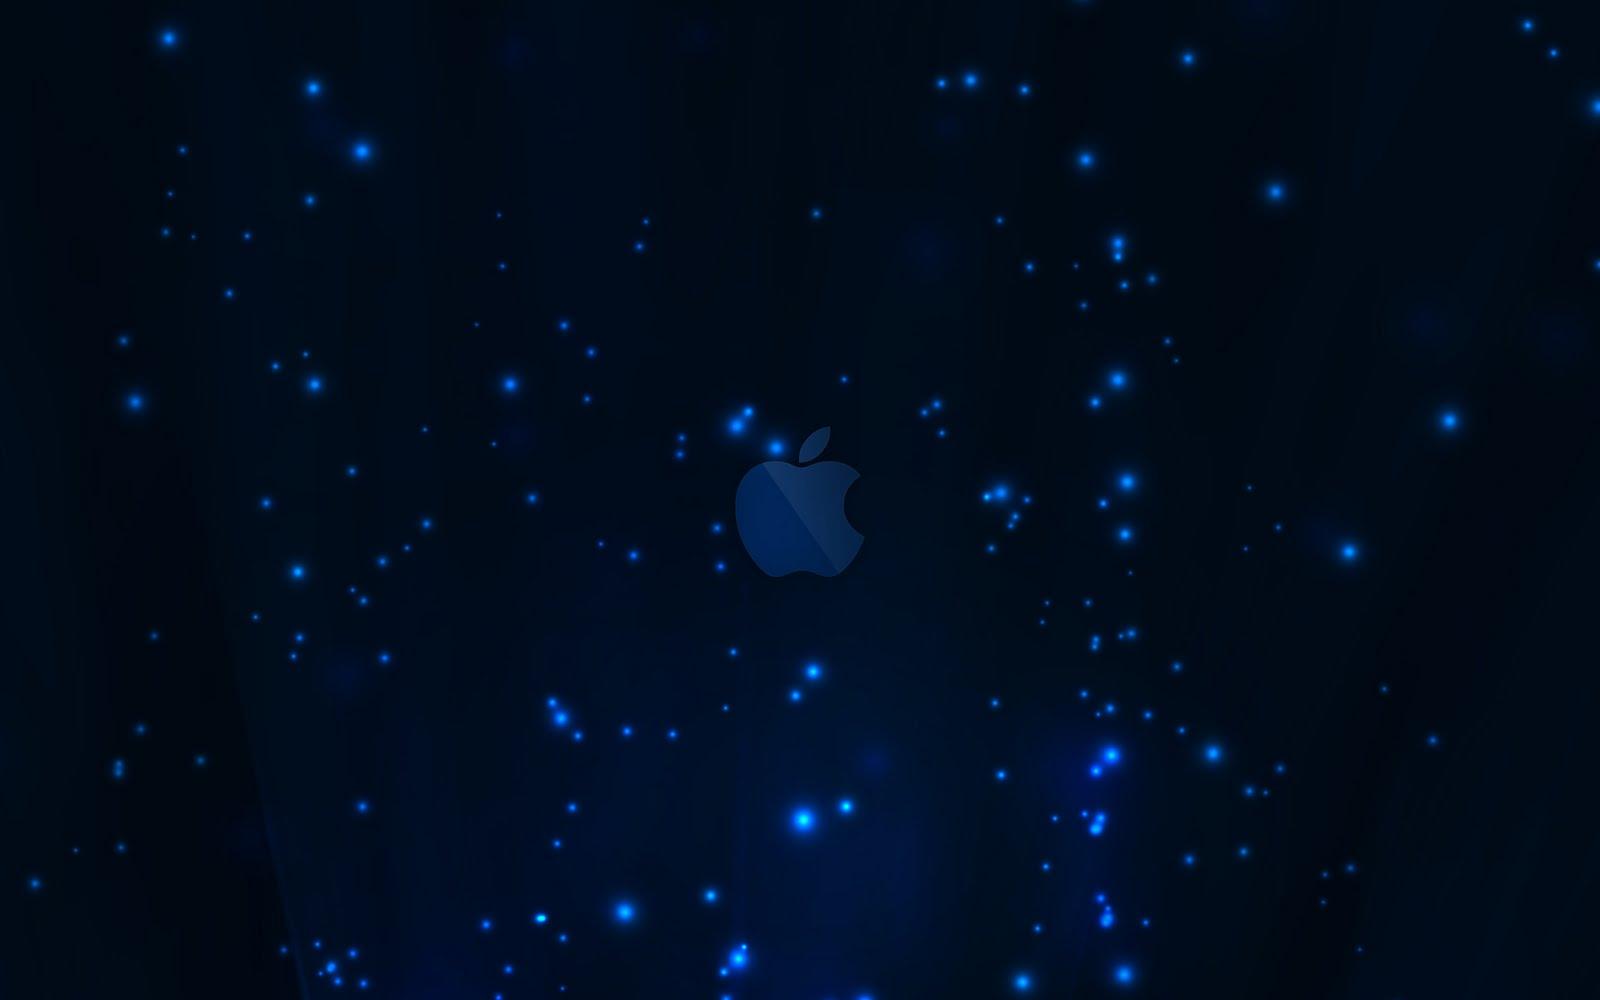 http://4.bp.blogspot.com/-e7H9hVZhYAo/TY182h7a5eI/AAAAAAAAHfc/9HNfXaHXHVg/s1600/Mac-Wallpaper-Apple-Mac-Wallpapers-Snow-Leopard-Wallpapers-HD-Apple-iPhone-Free-Desktop-Backgrounds-Red%252BBlack-Apple-sexy-mac-apple-lucy-pinder-wallpapers-indian-hollywood-